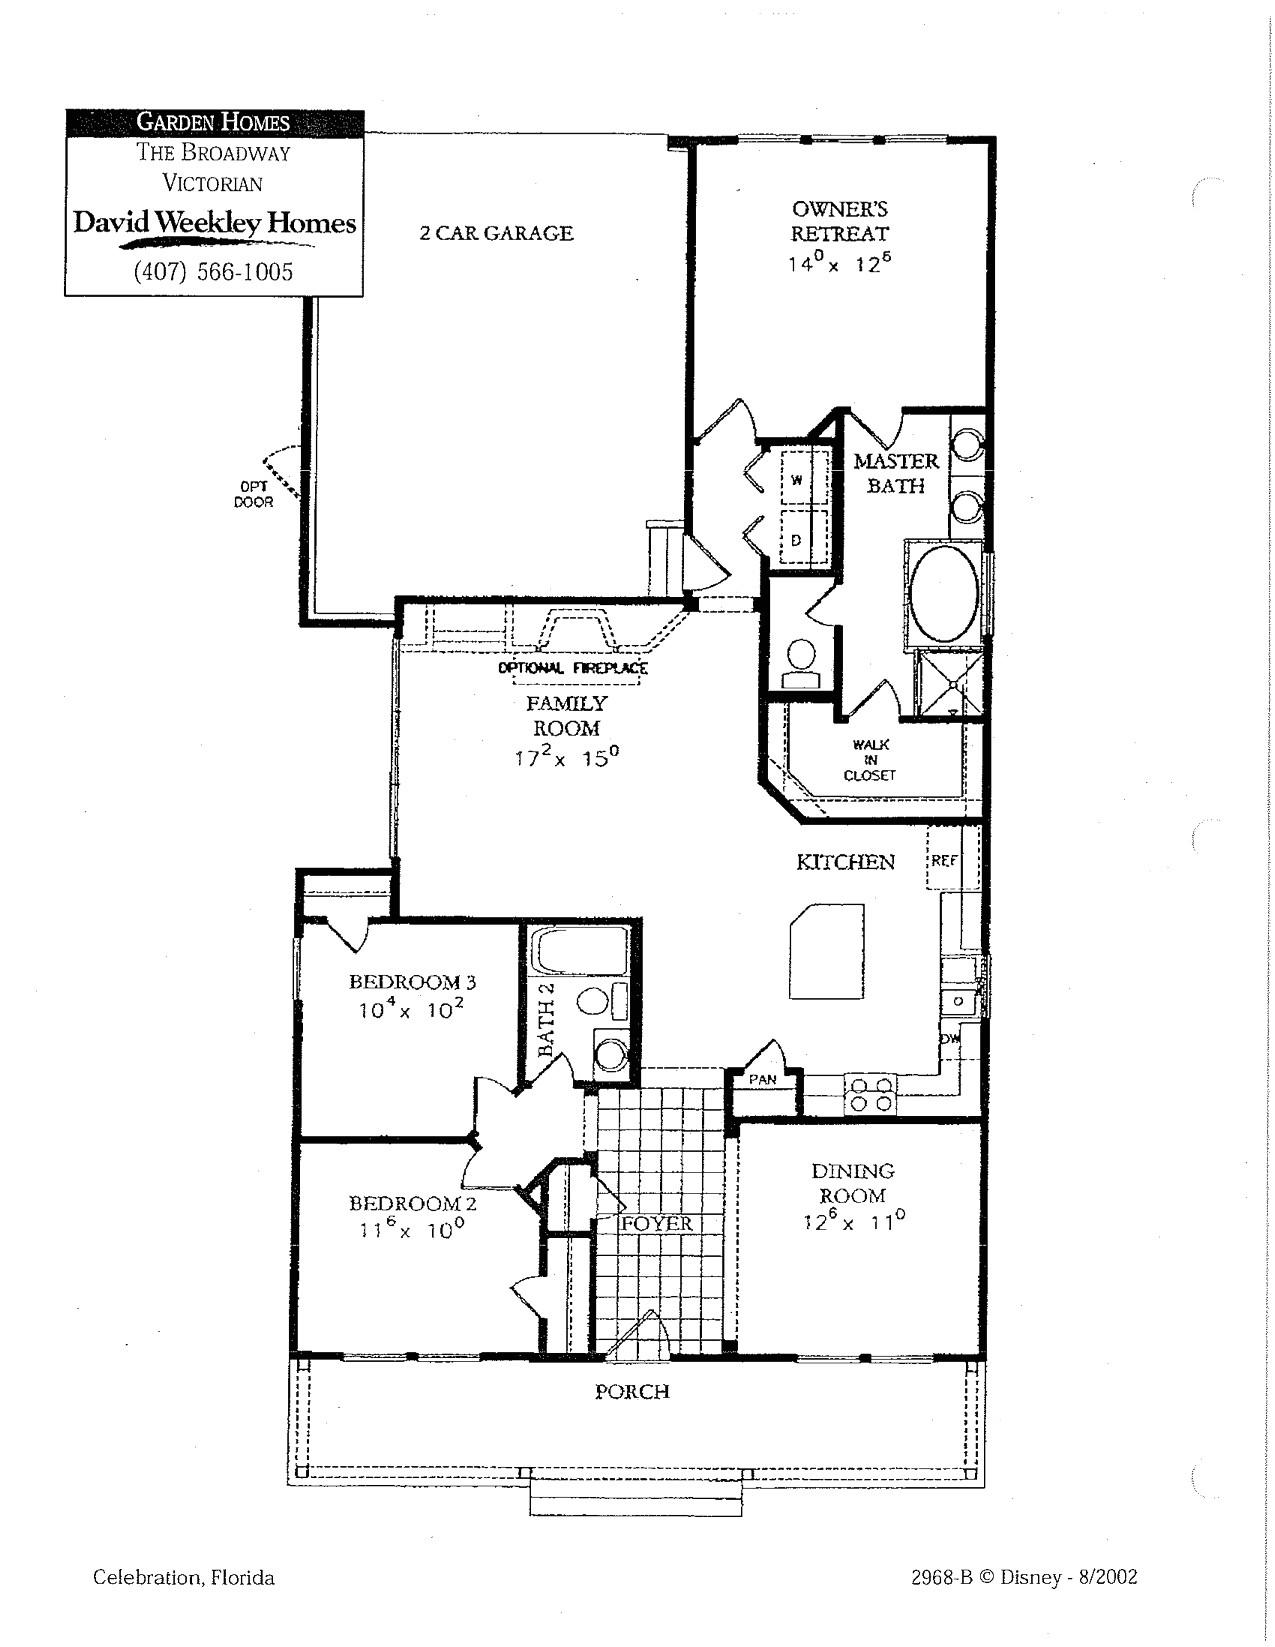 shea home floor plans new floor plan camelback shotgun house plans luxury shotgun house floor